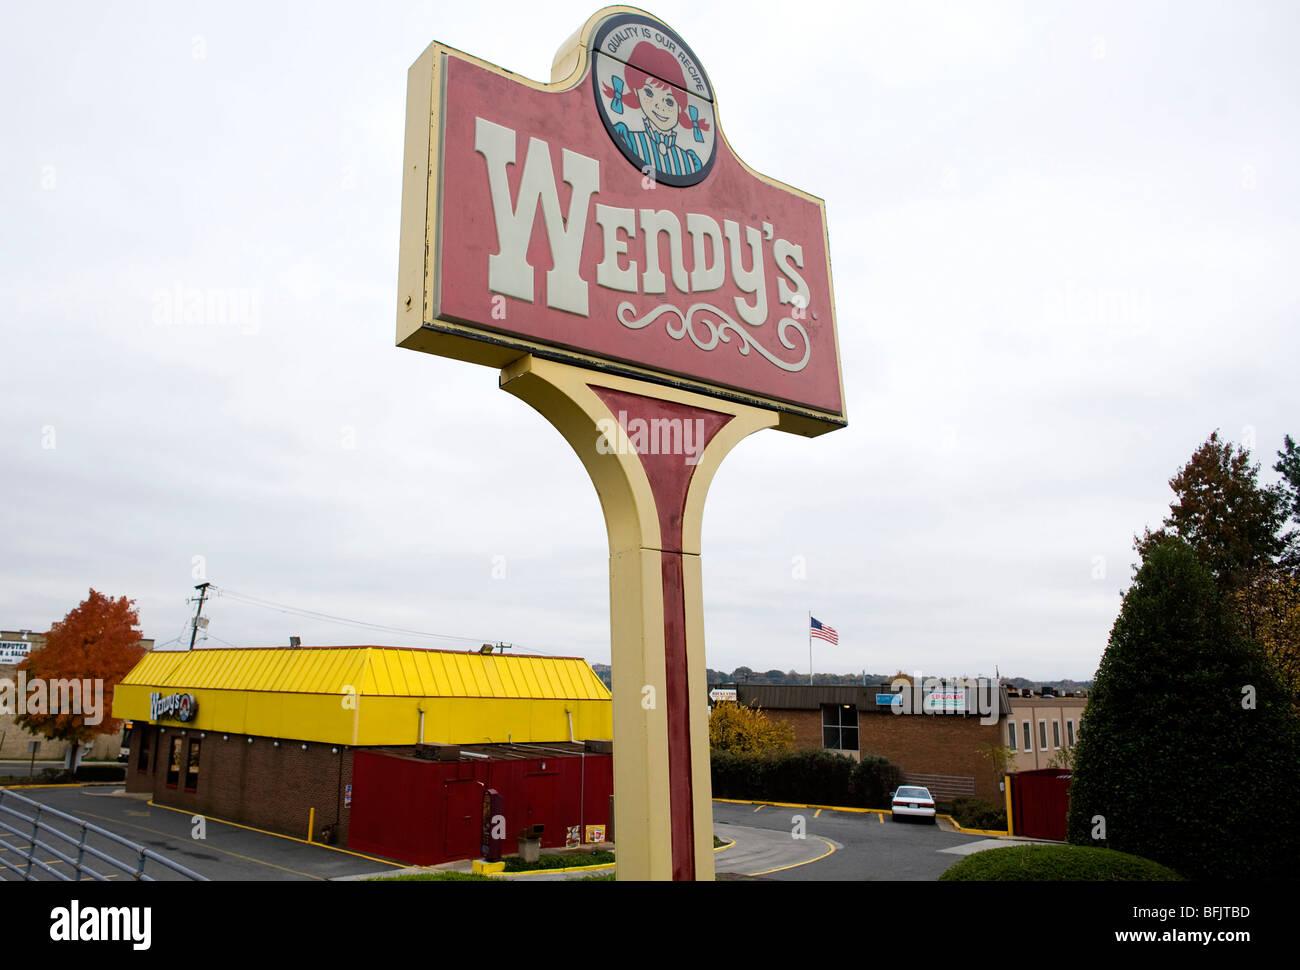 Wendys Stock Photos & Wendys Stock Images - Alamy